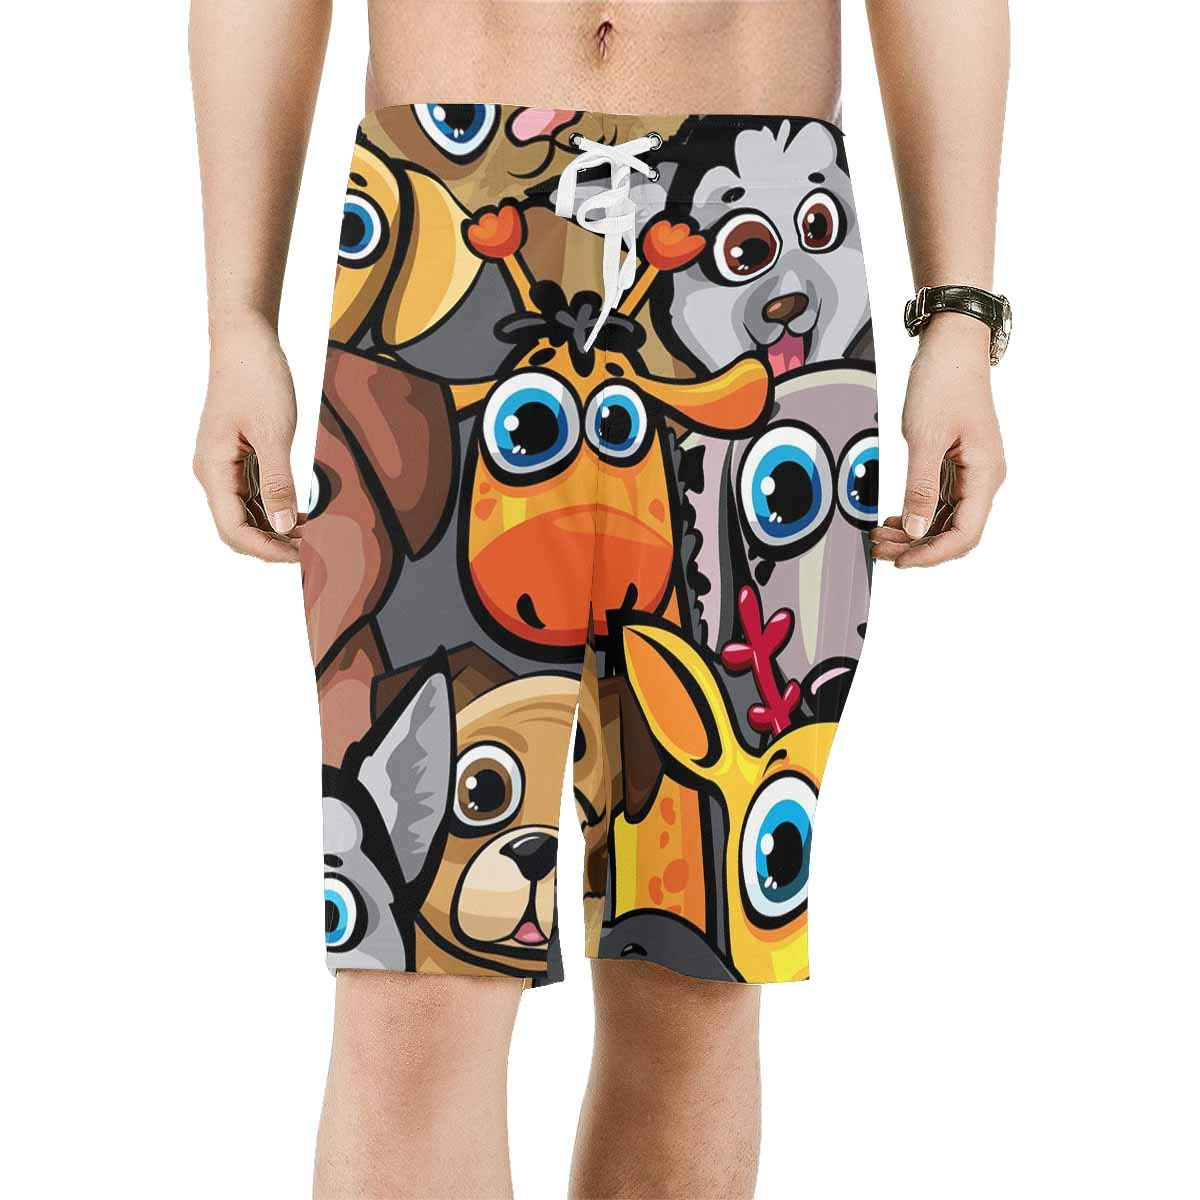 INTERESTPRINT Mens Water Shorts Funny Dogs Cat Deer Quick Dry Beach Shorts XS-6XL